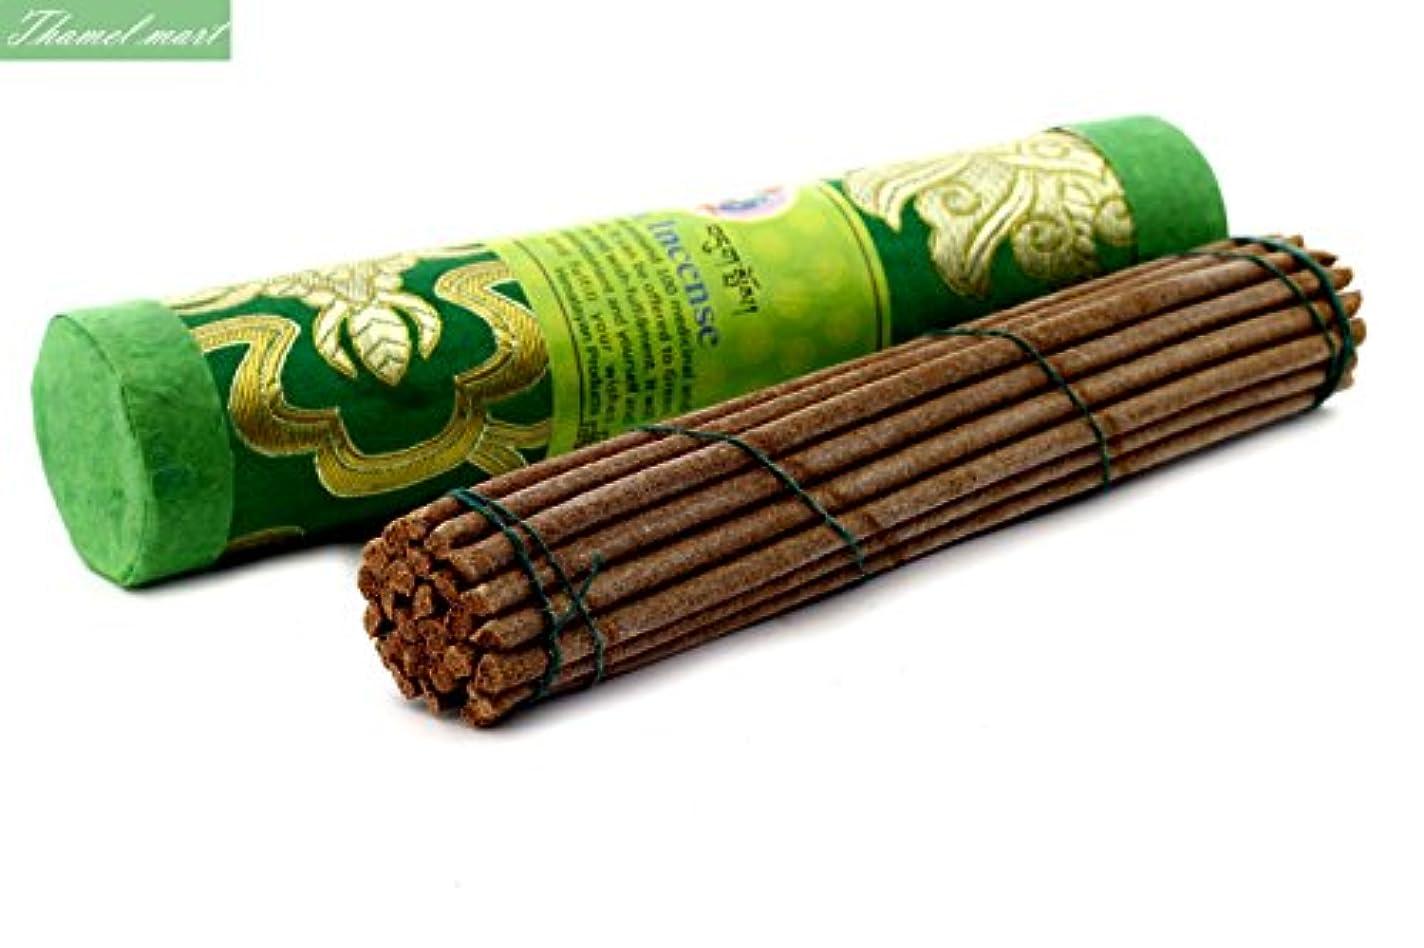 Green Tara Tibetan Incense Sticks – Spiritual & Medicinal Relaxation Potpourrisより – 効果的& Scented Oils